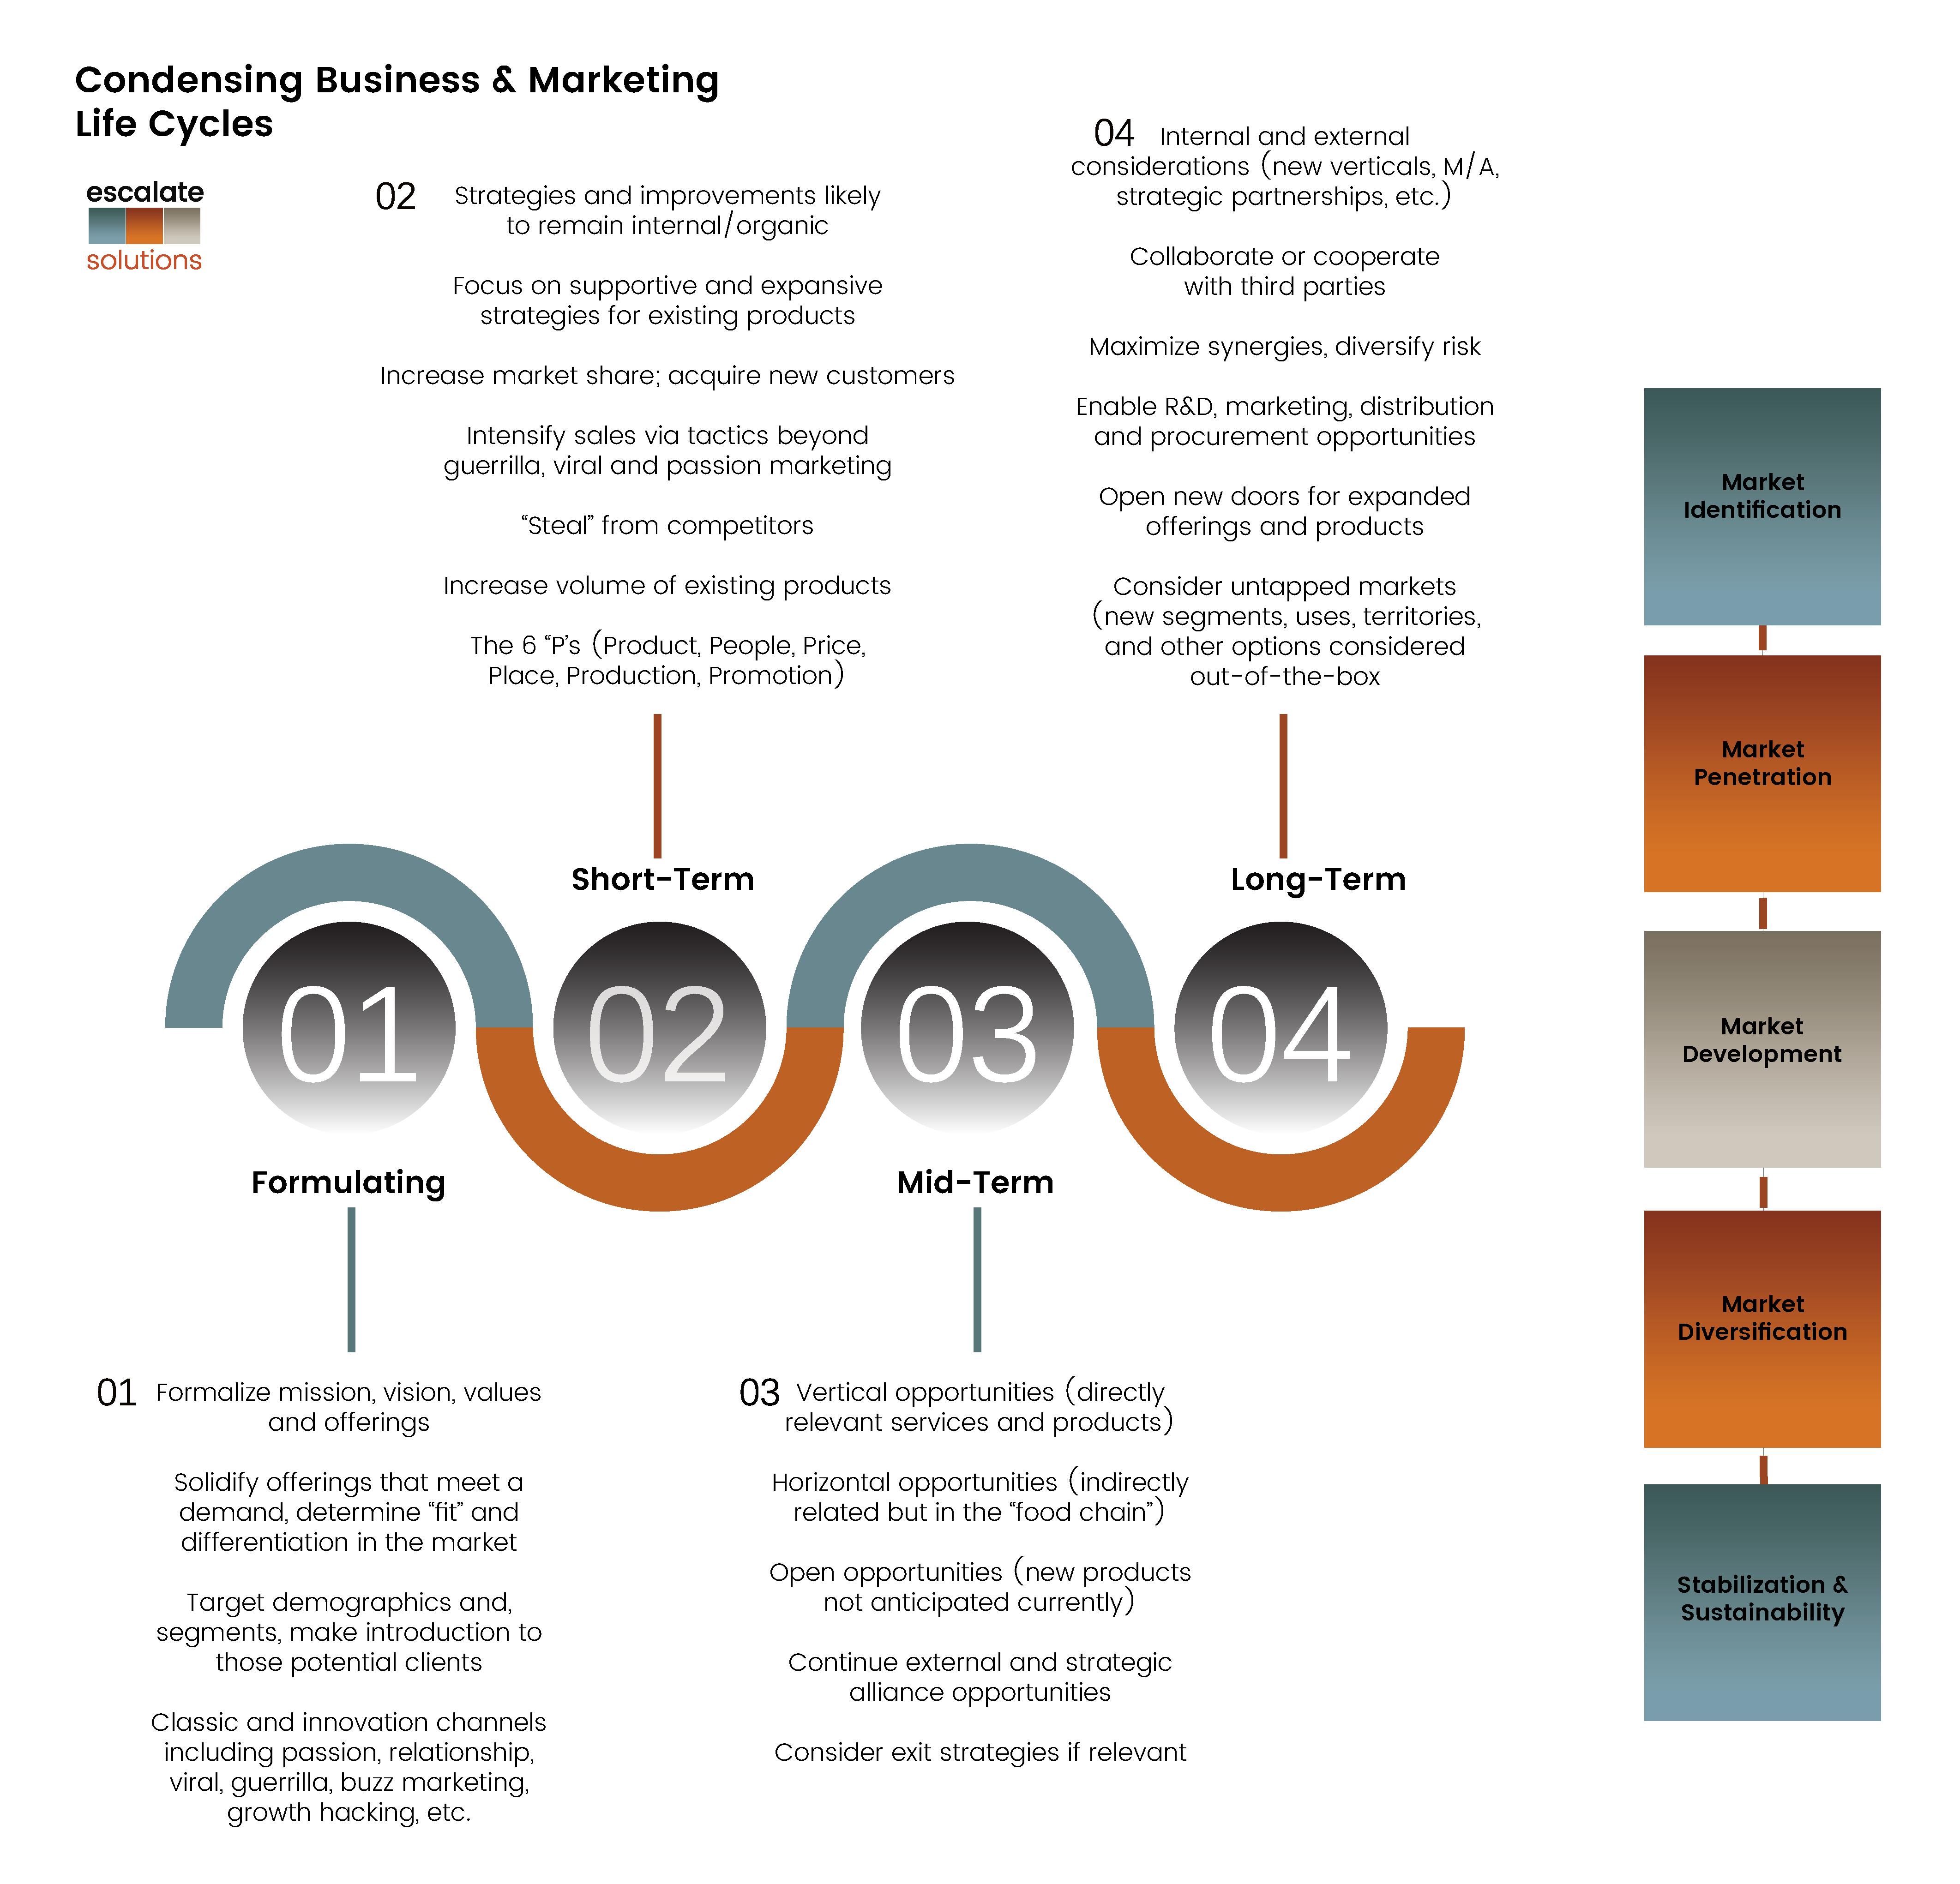 process timeline adjusted for four